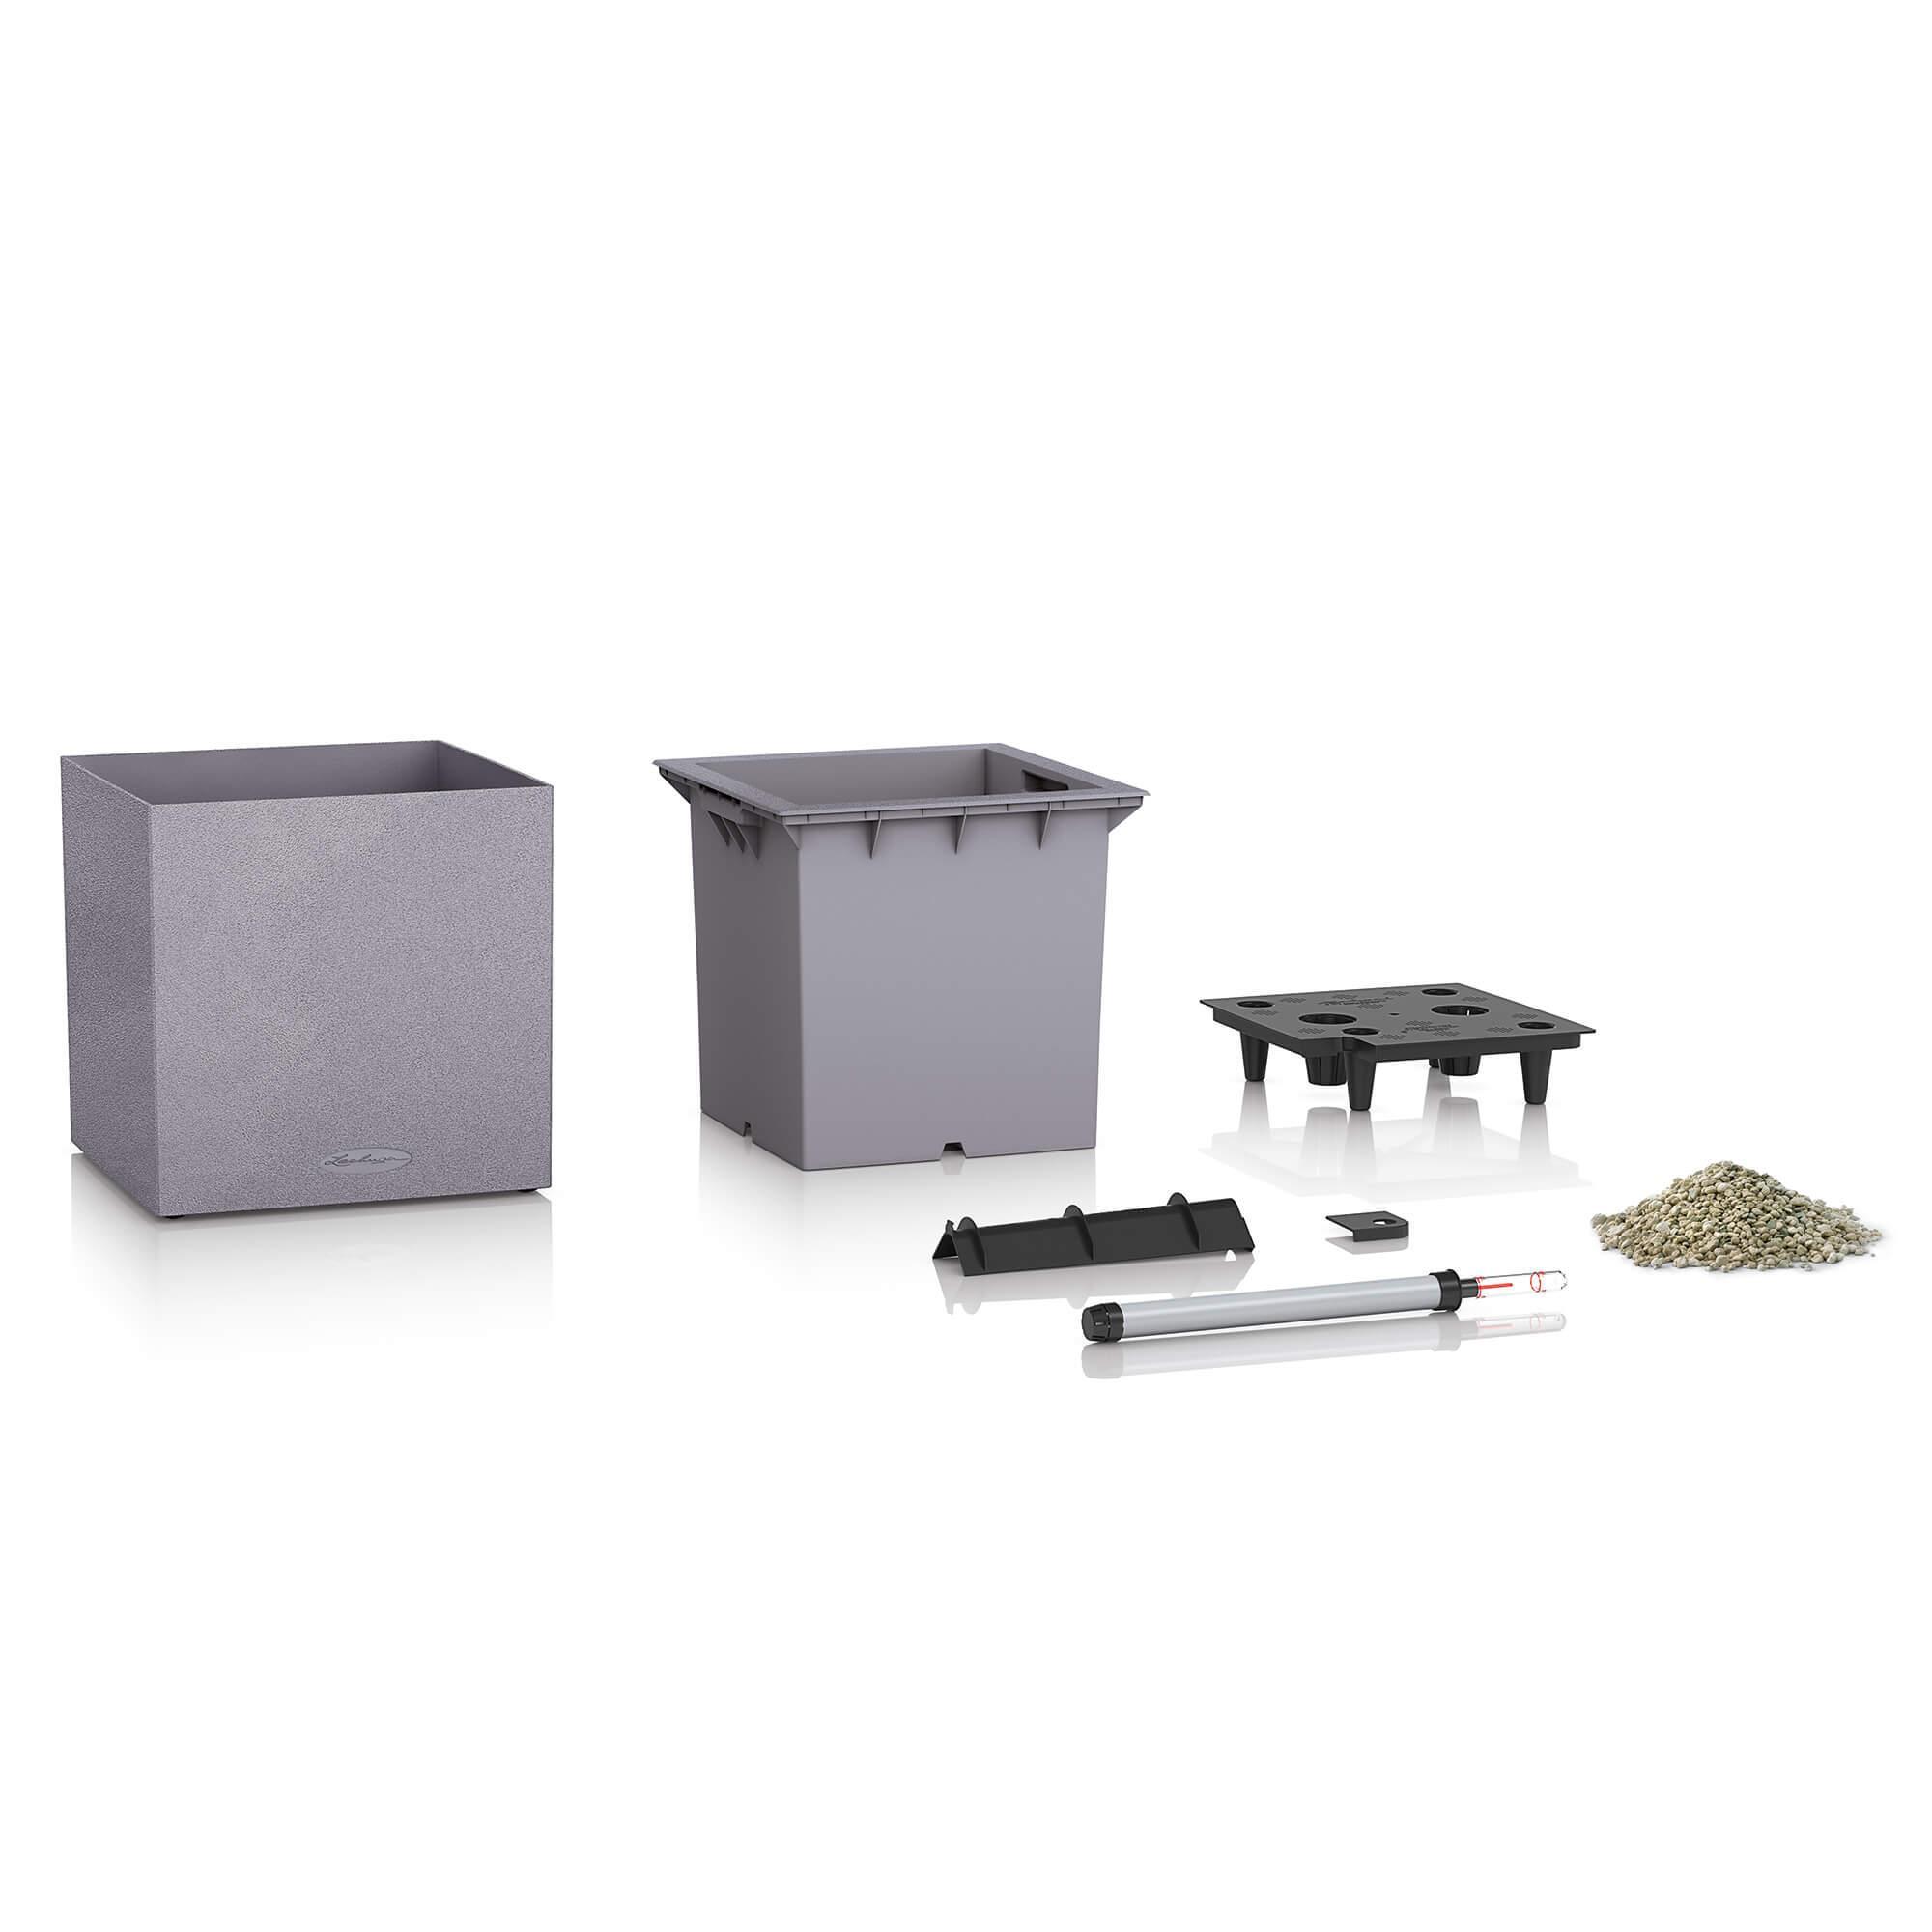 CANTO Color cube 30 stone gray - Image 1